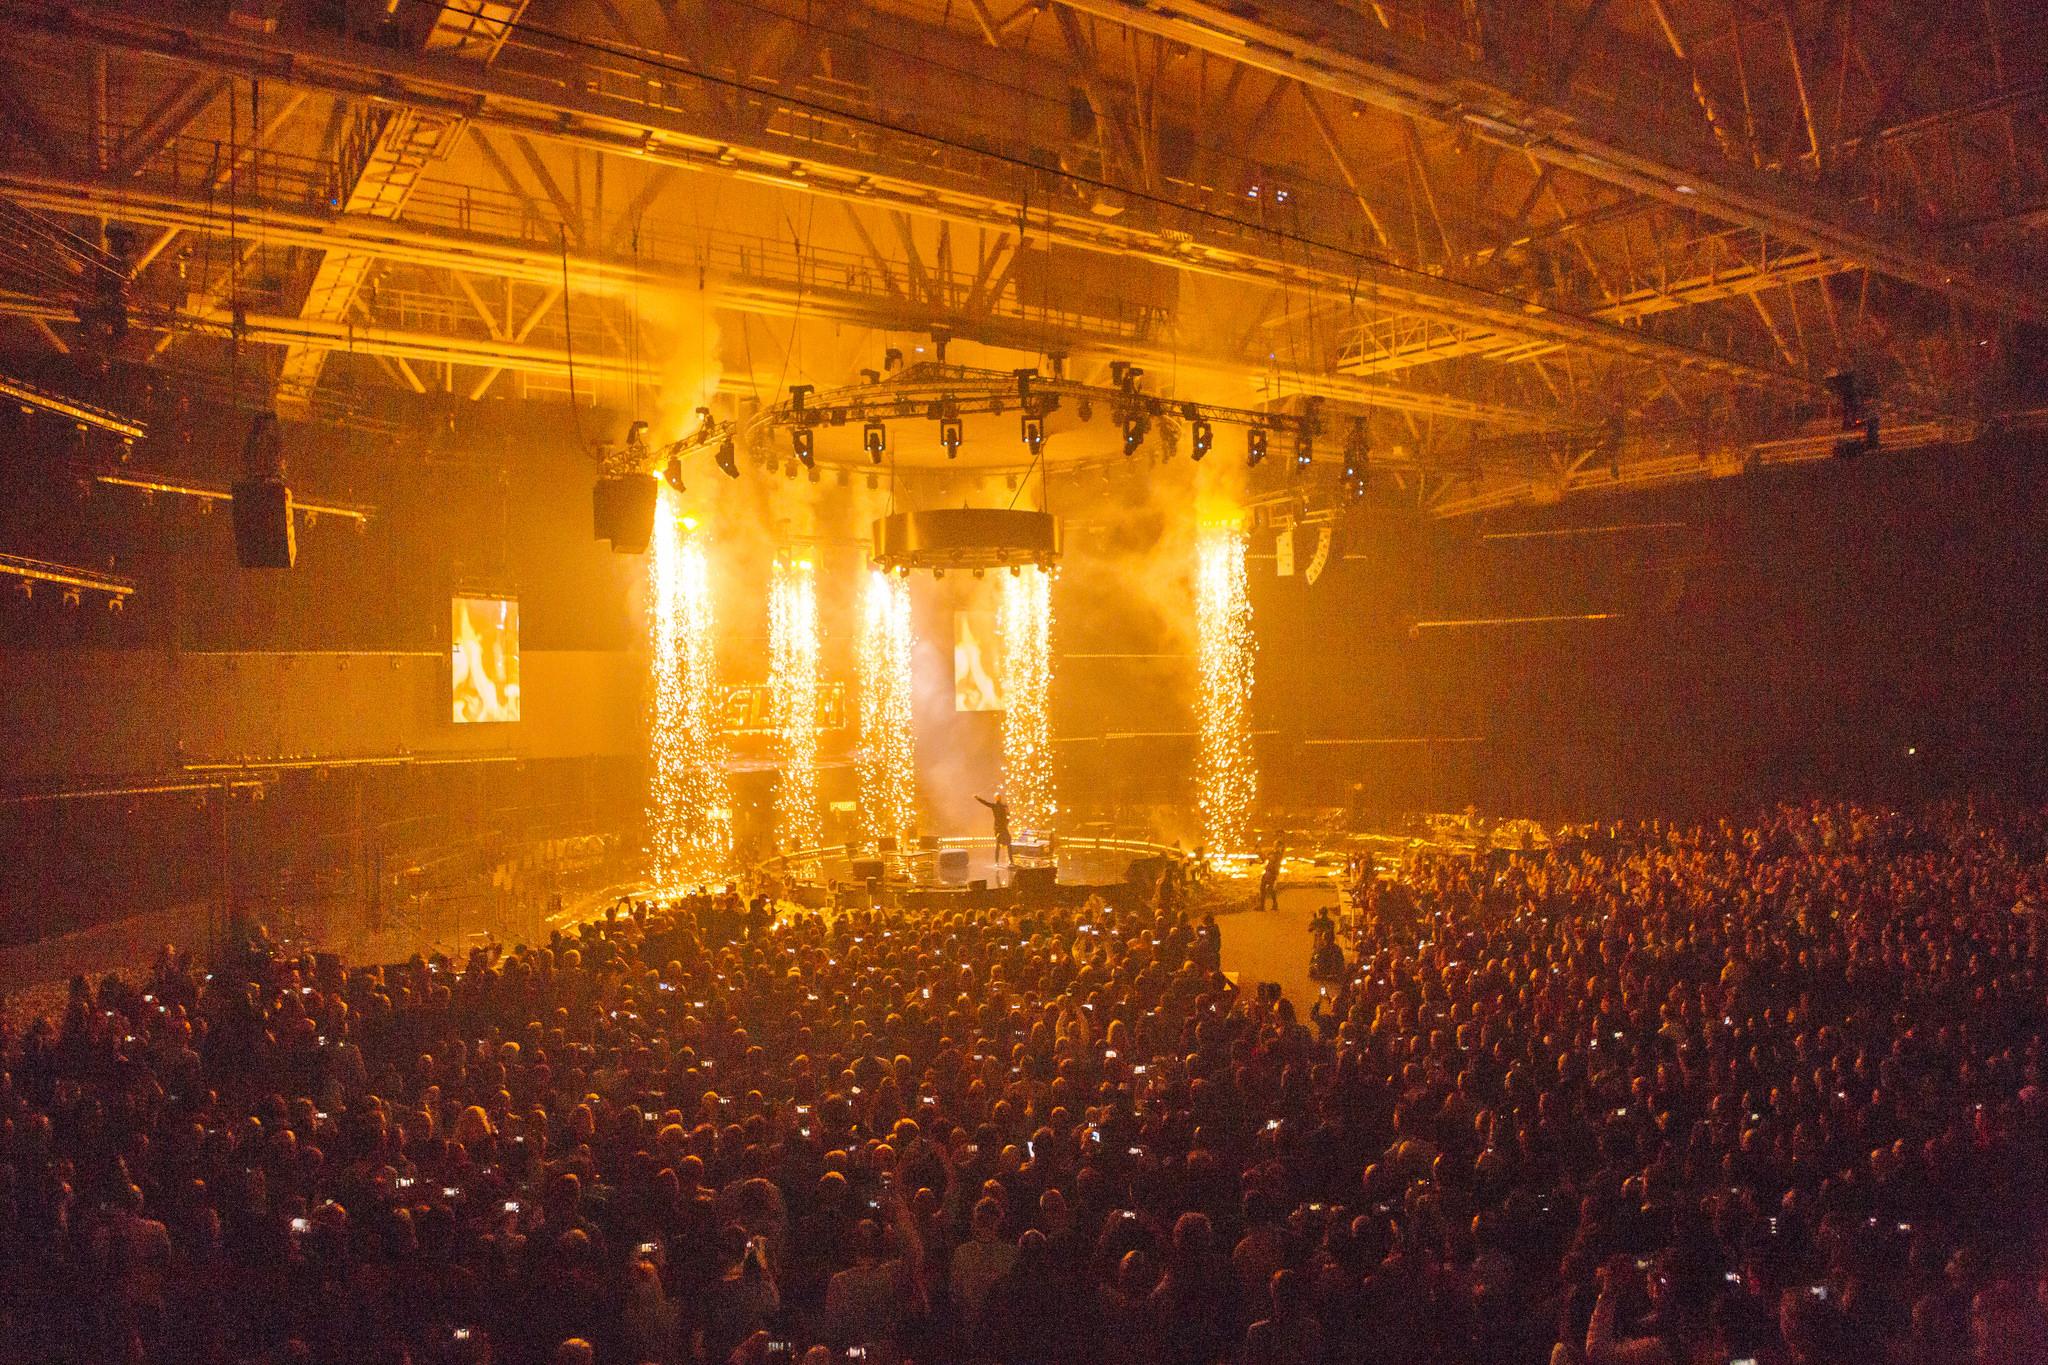 Stage moment from Slush 2016 / Credit: Petri Anttila